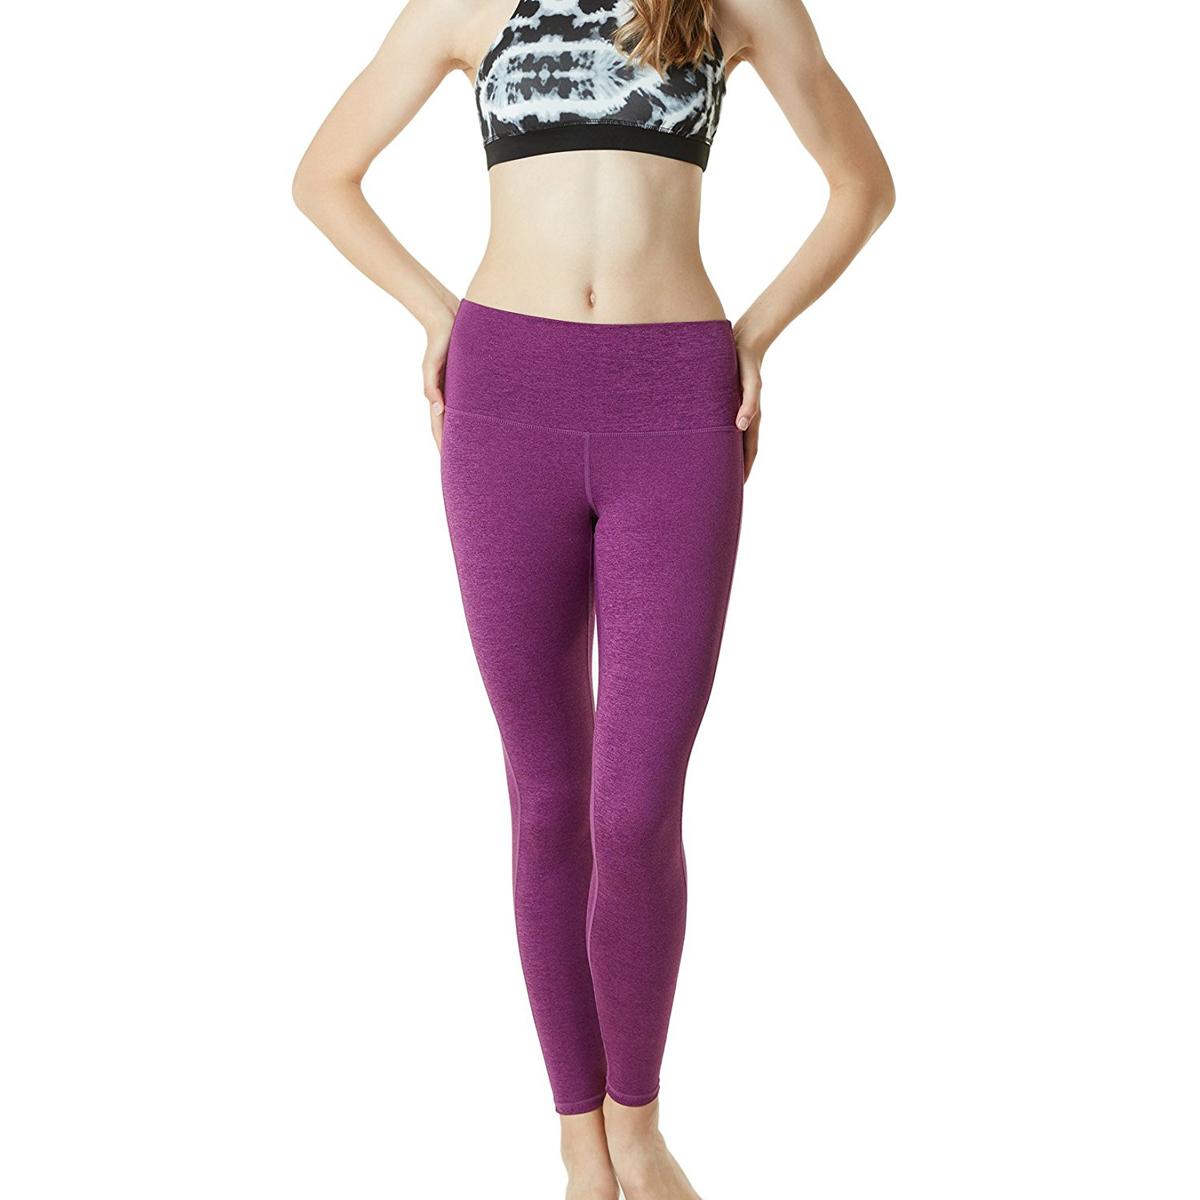 thumbnail 17 - TSLA Tesla FYP42 Women's High-Waisted Ultra-Stretch Tummy Control Yoga Pants